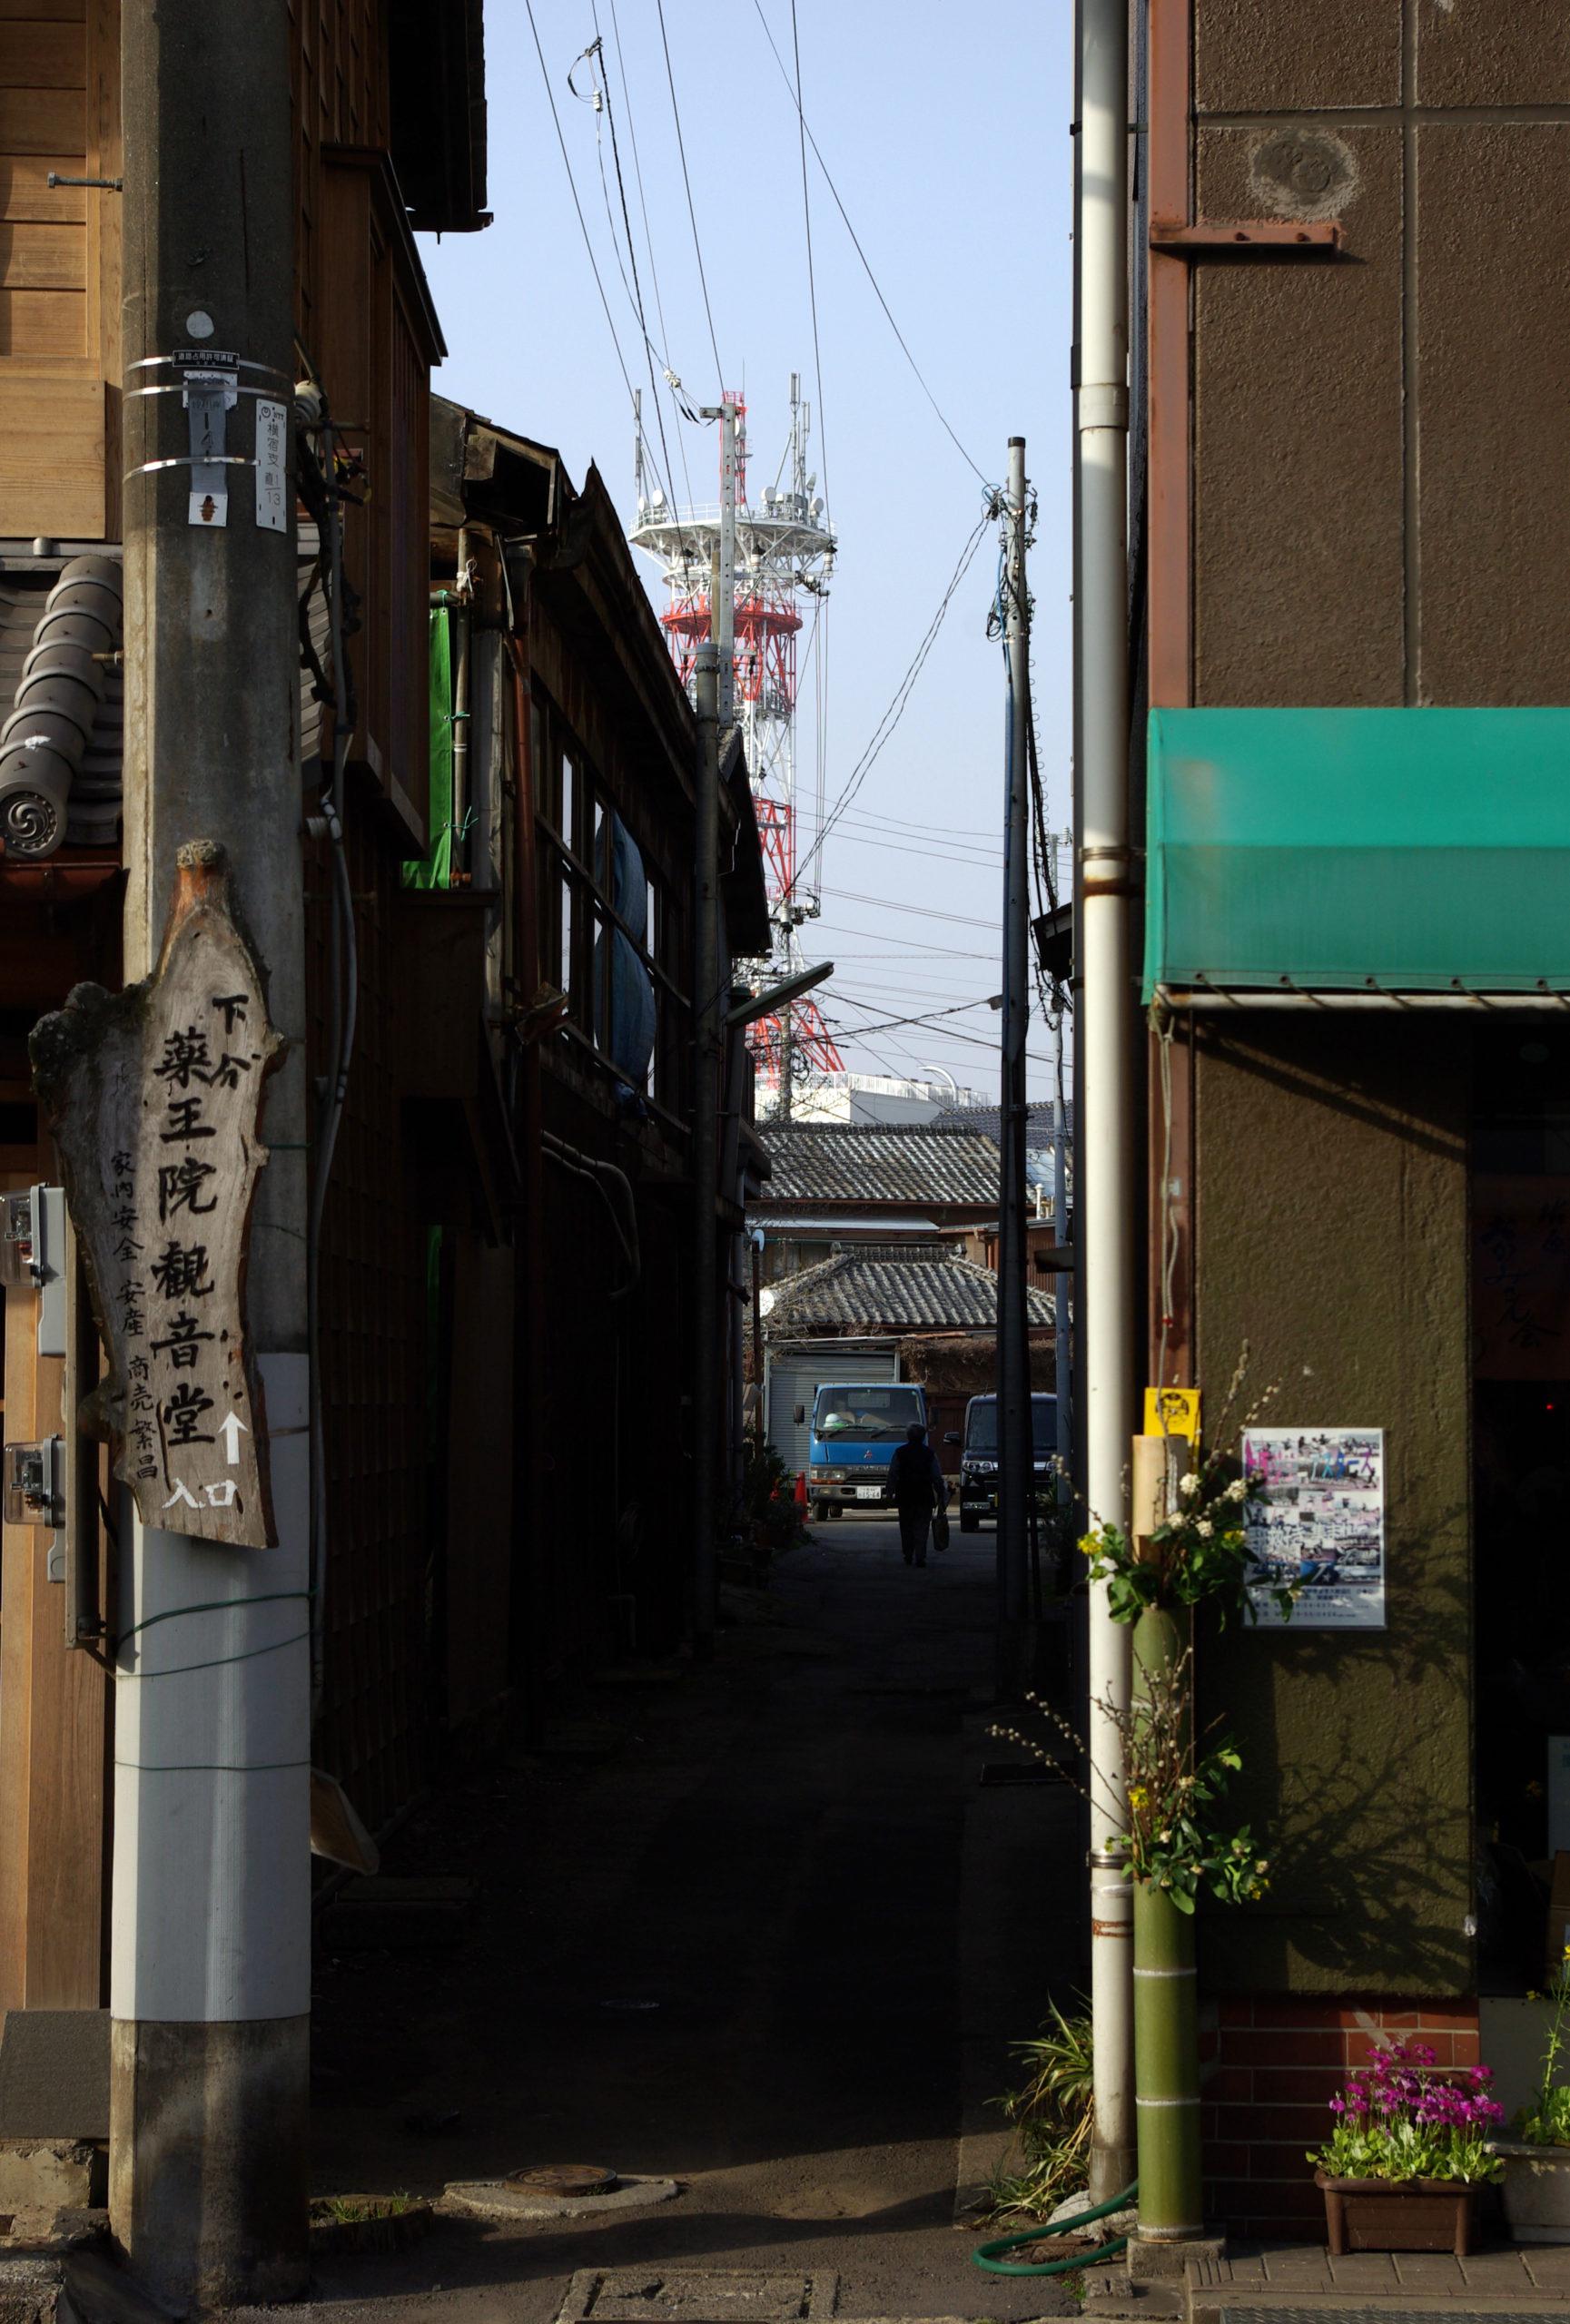 Sawara, Japan, 2008